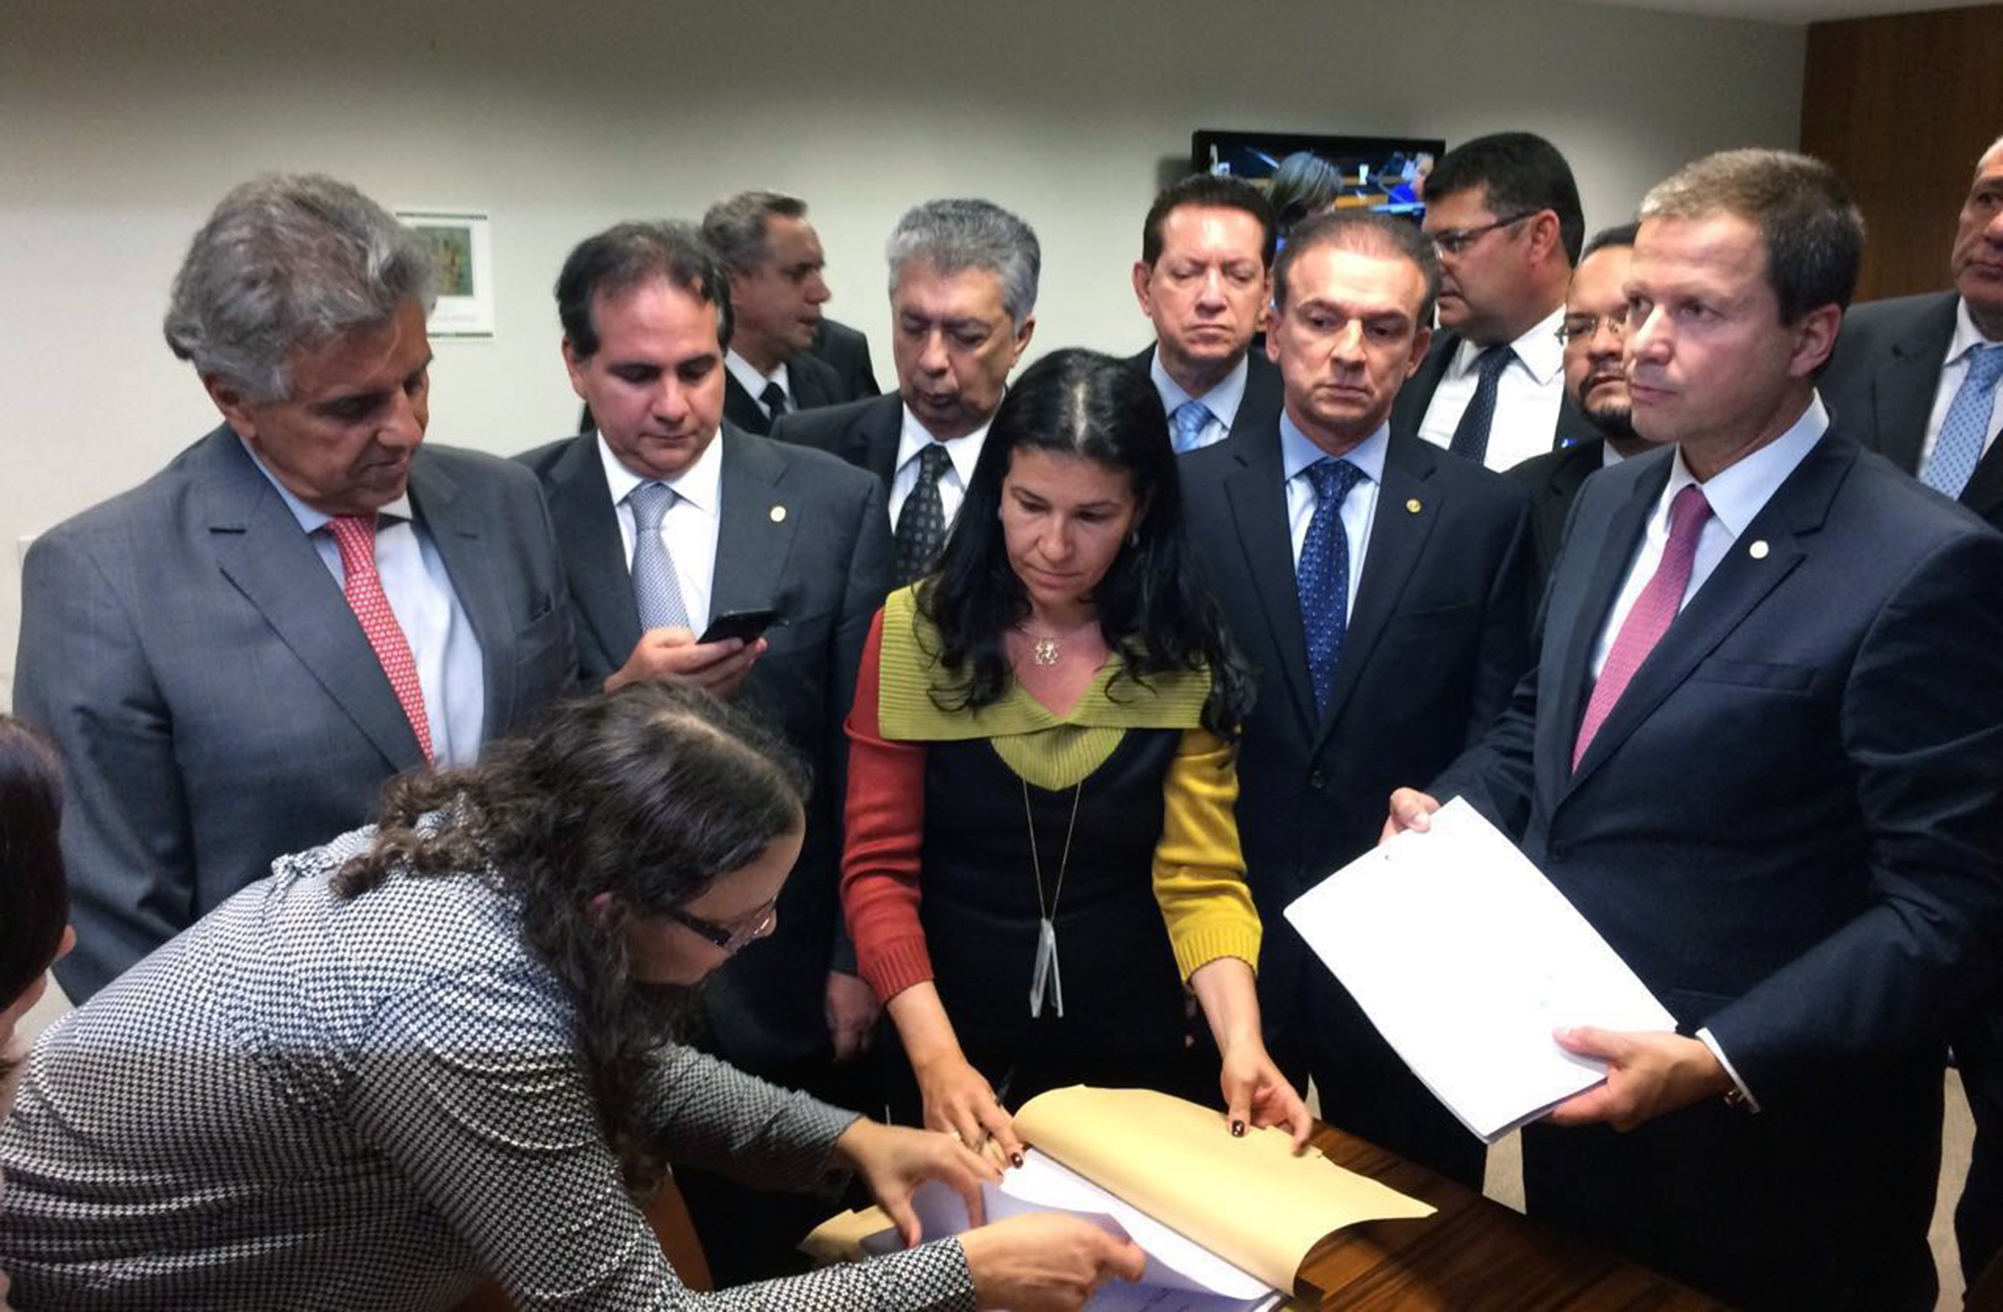 OAB protocola pedido de impeachment contra presidente Dilma Rousseff